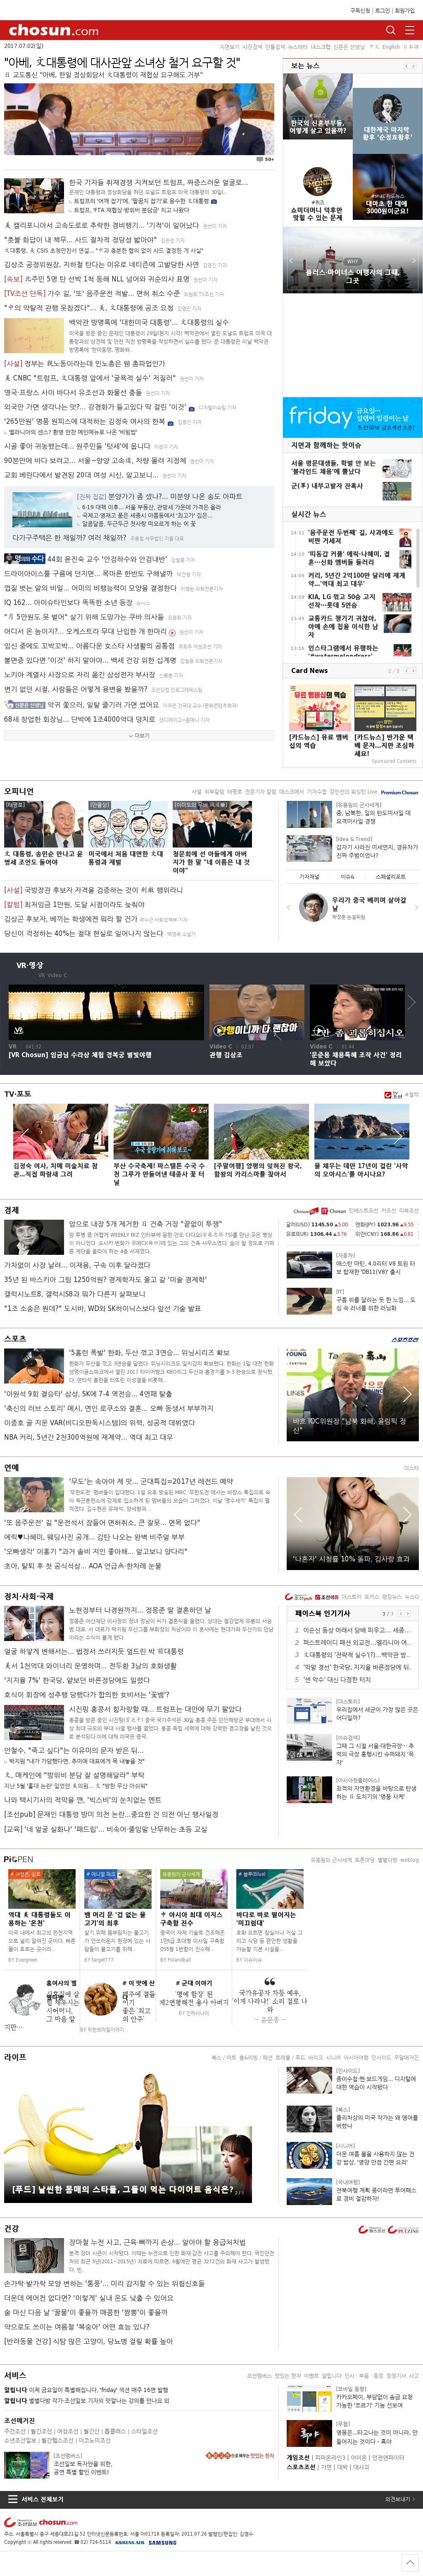 chosun.com at Saturday July 1, 2017, 4:02 p.m. UTC